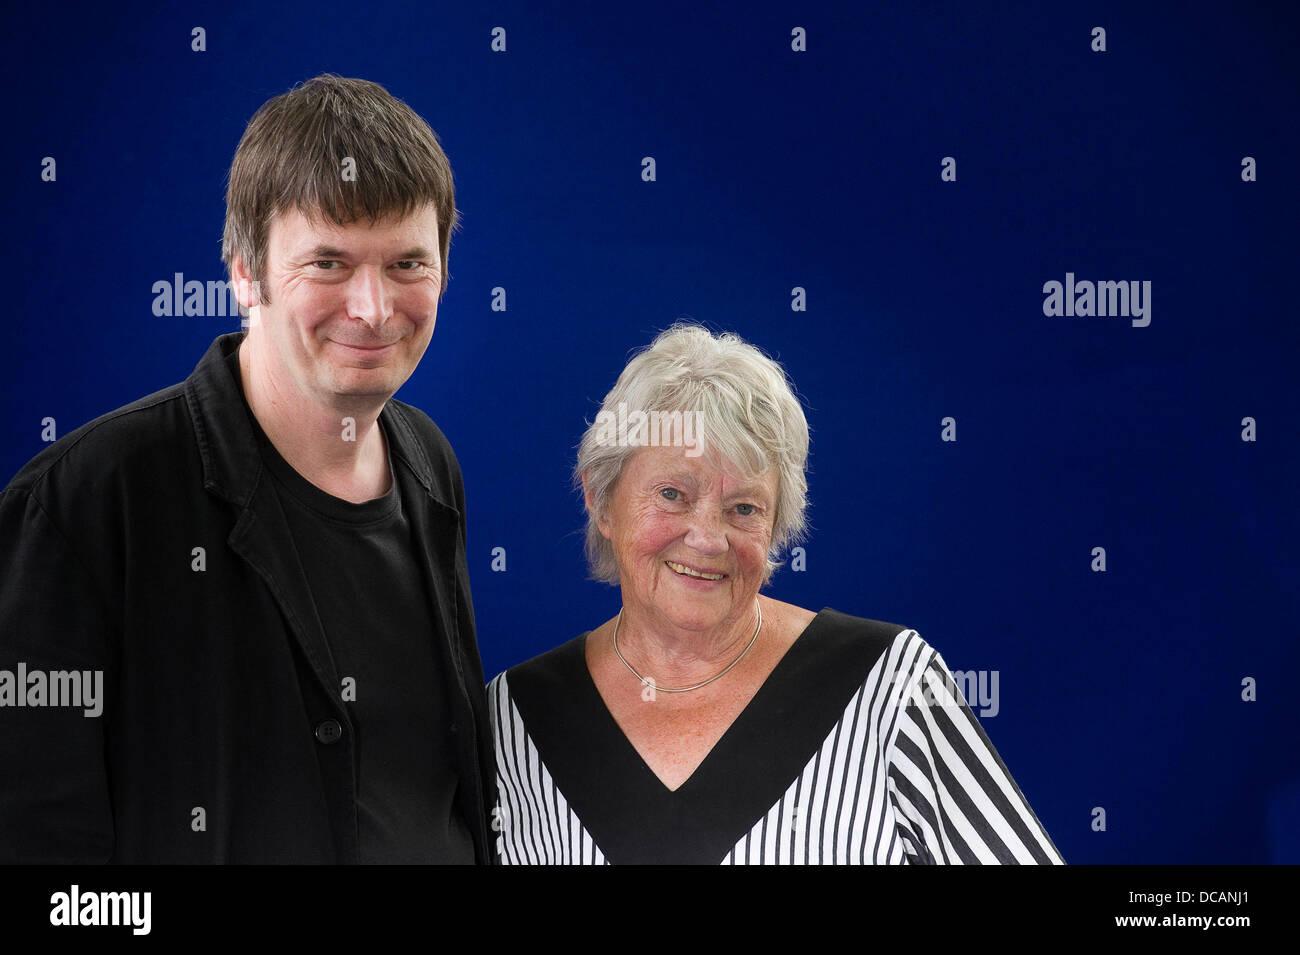 Edinburgh, UK. 14. August 2013.   Maj Sjowall und Ian Rankin beim Edinburgh International Book Festival. Alle Bilder Stockfoto